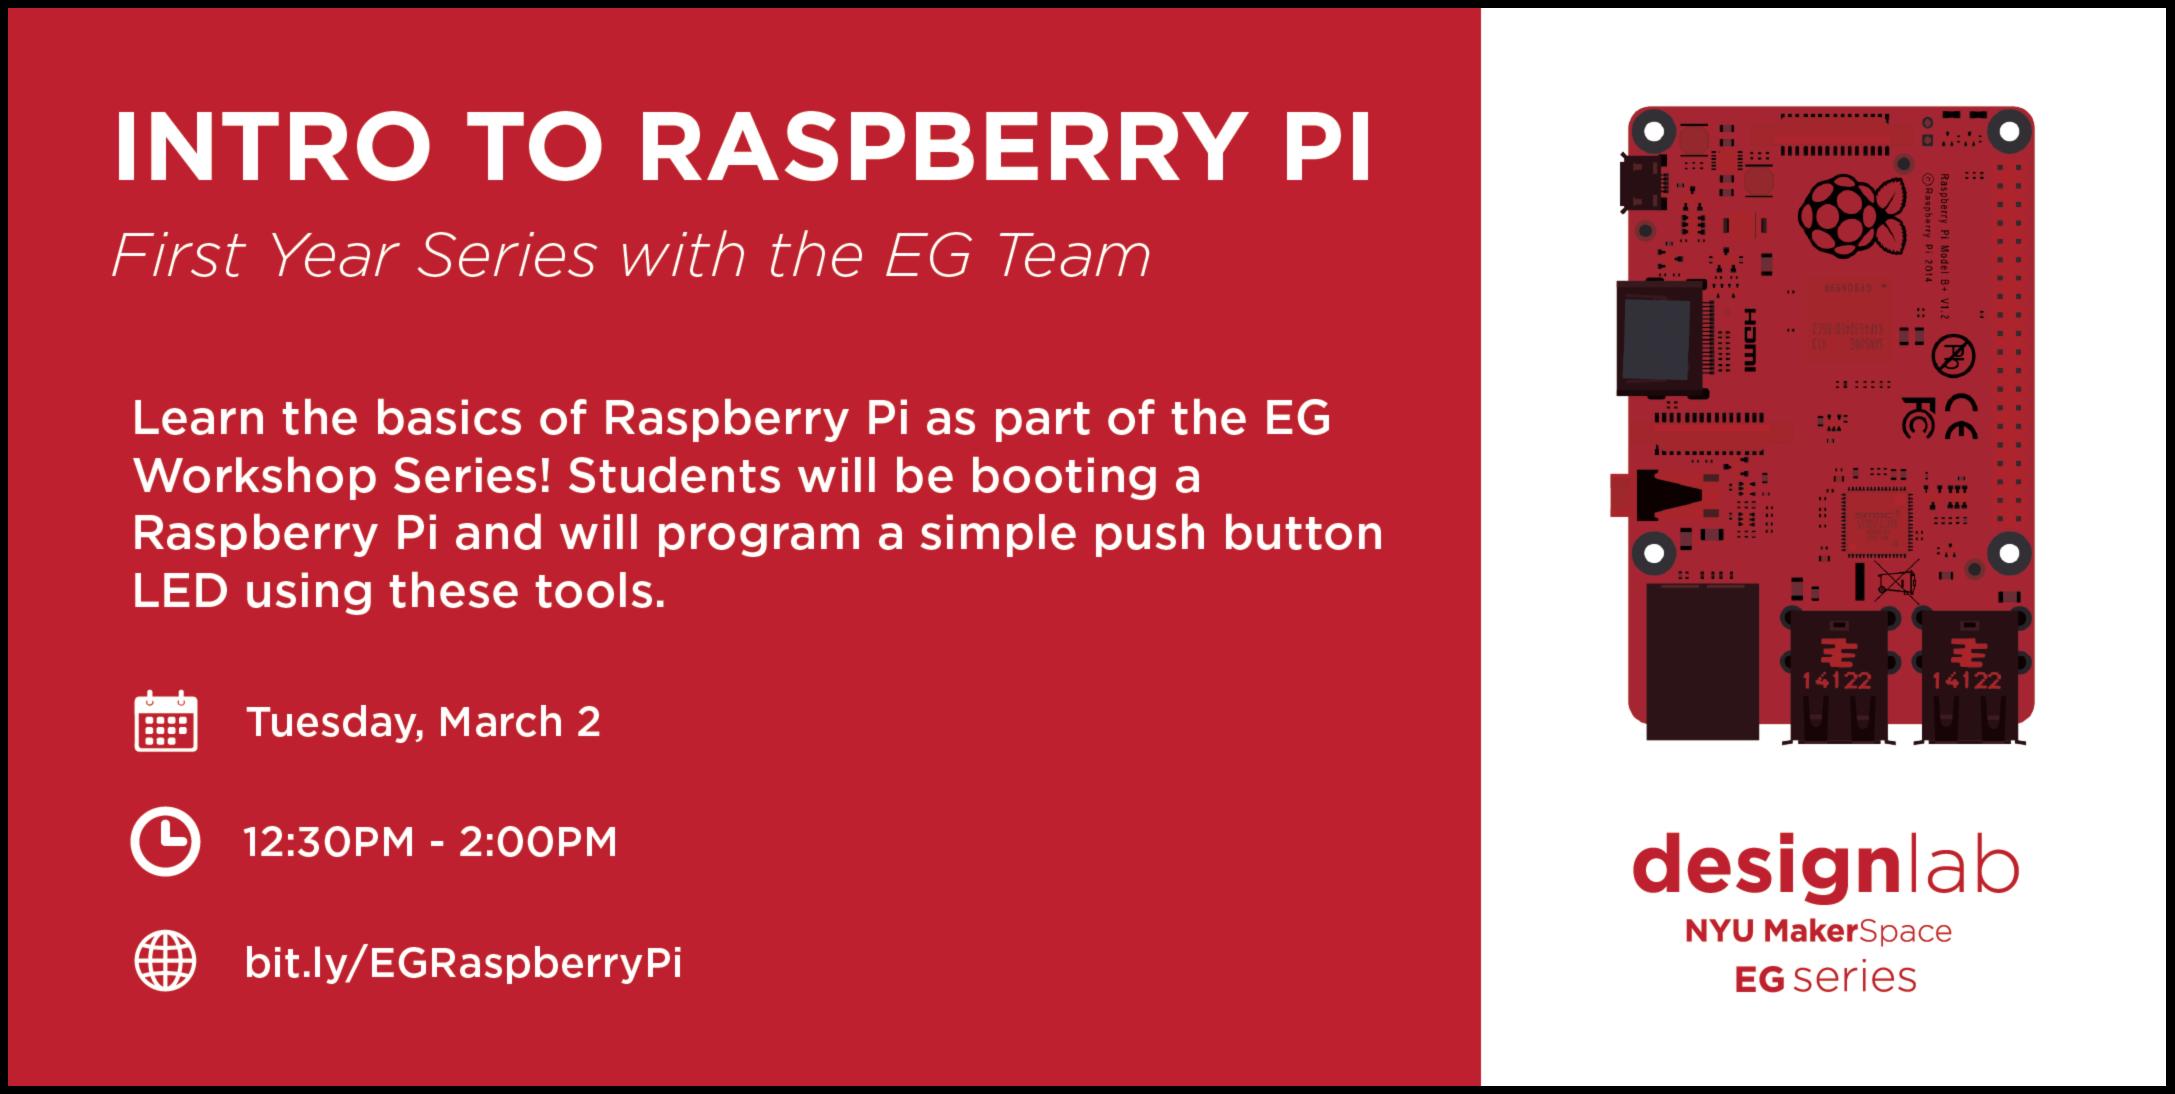 EG Raspberry Pi Flyer